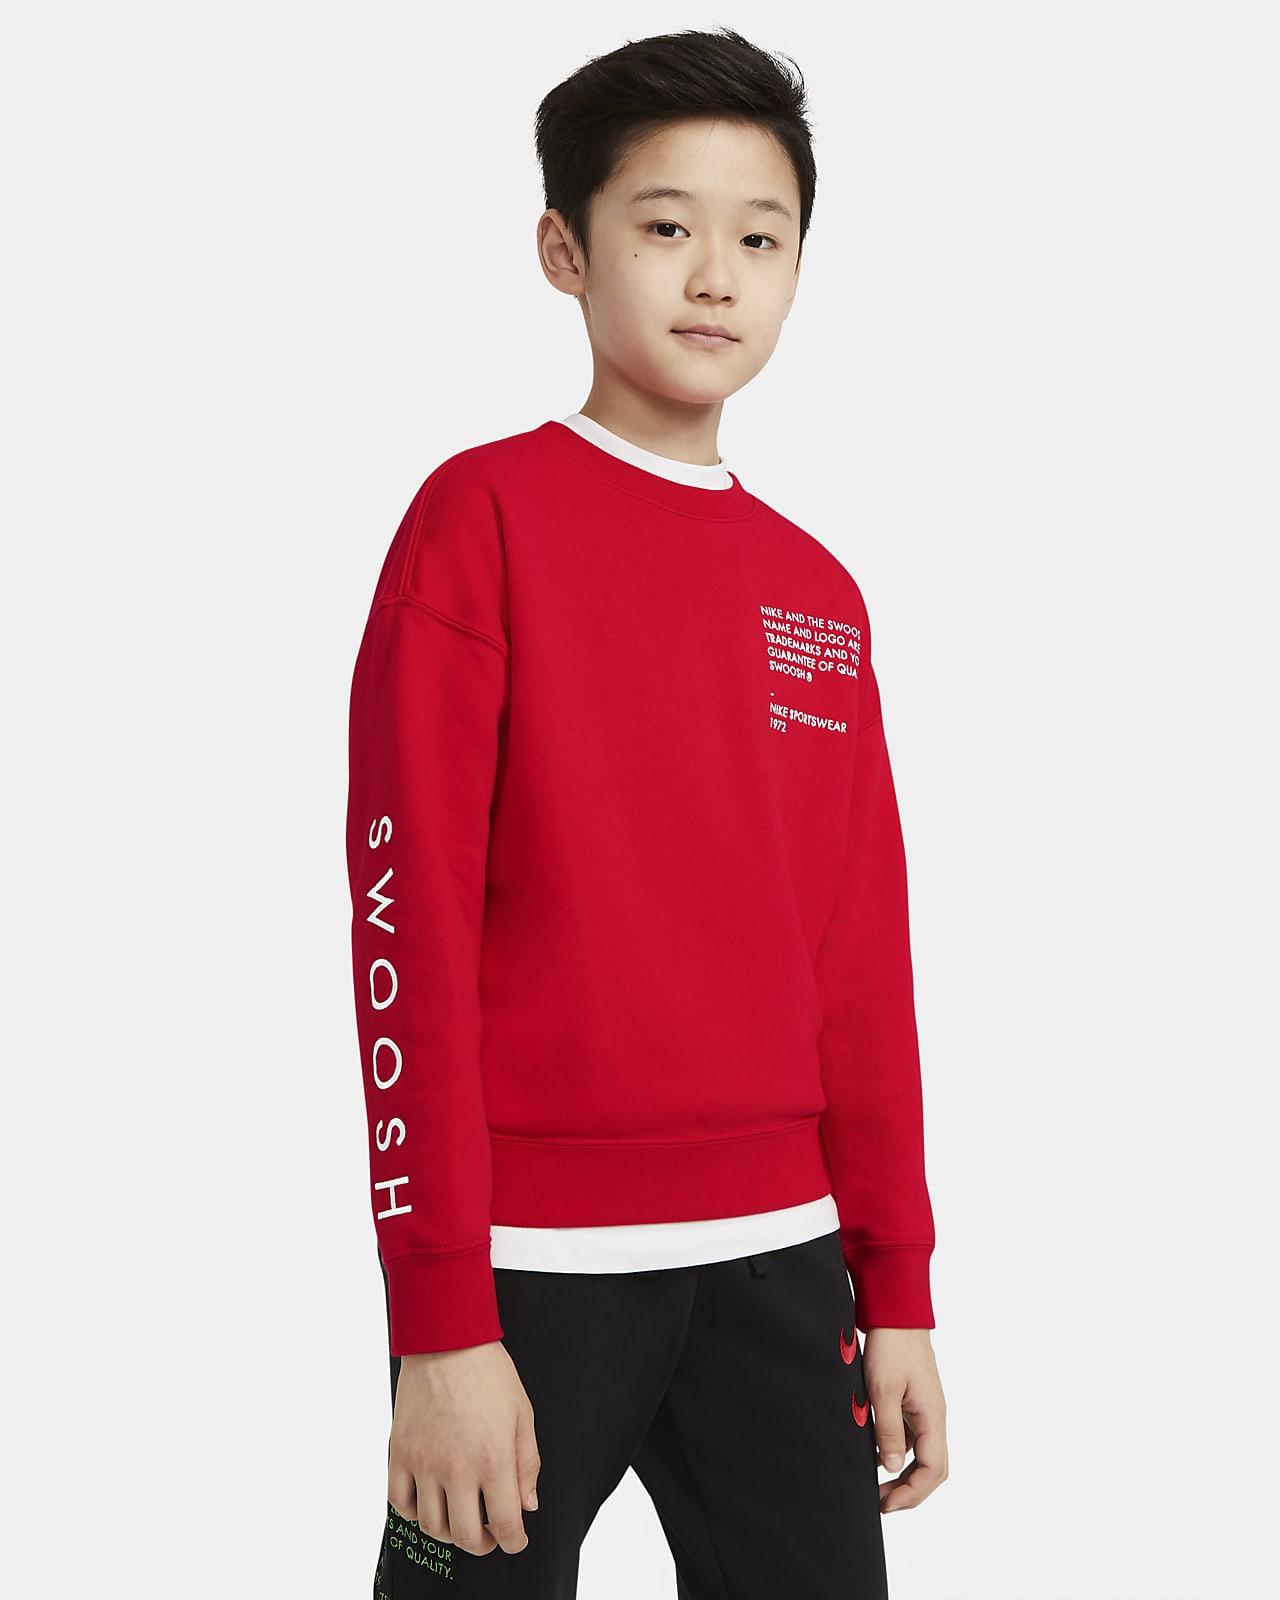 Nike Sportswear Swoosh Genç Çocuk (Erkek) Crew Üstü